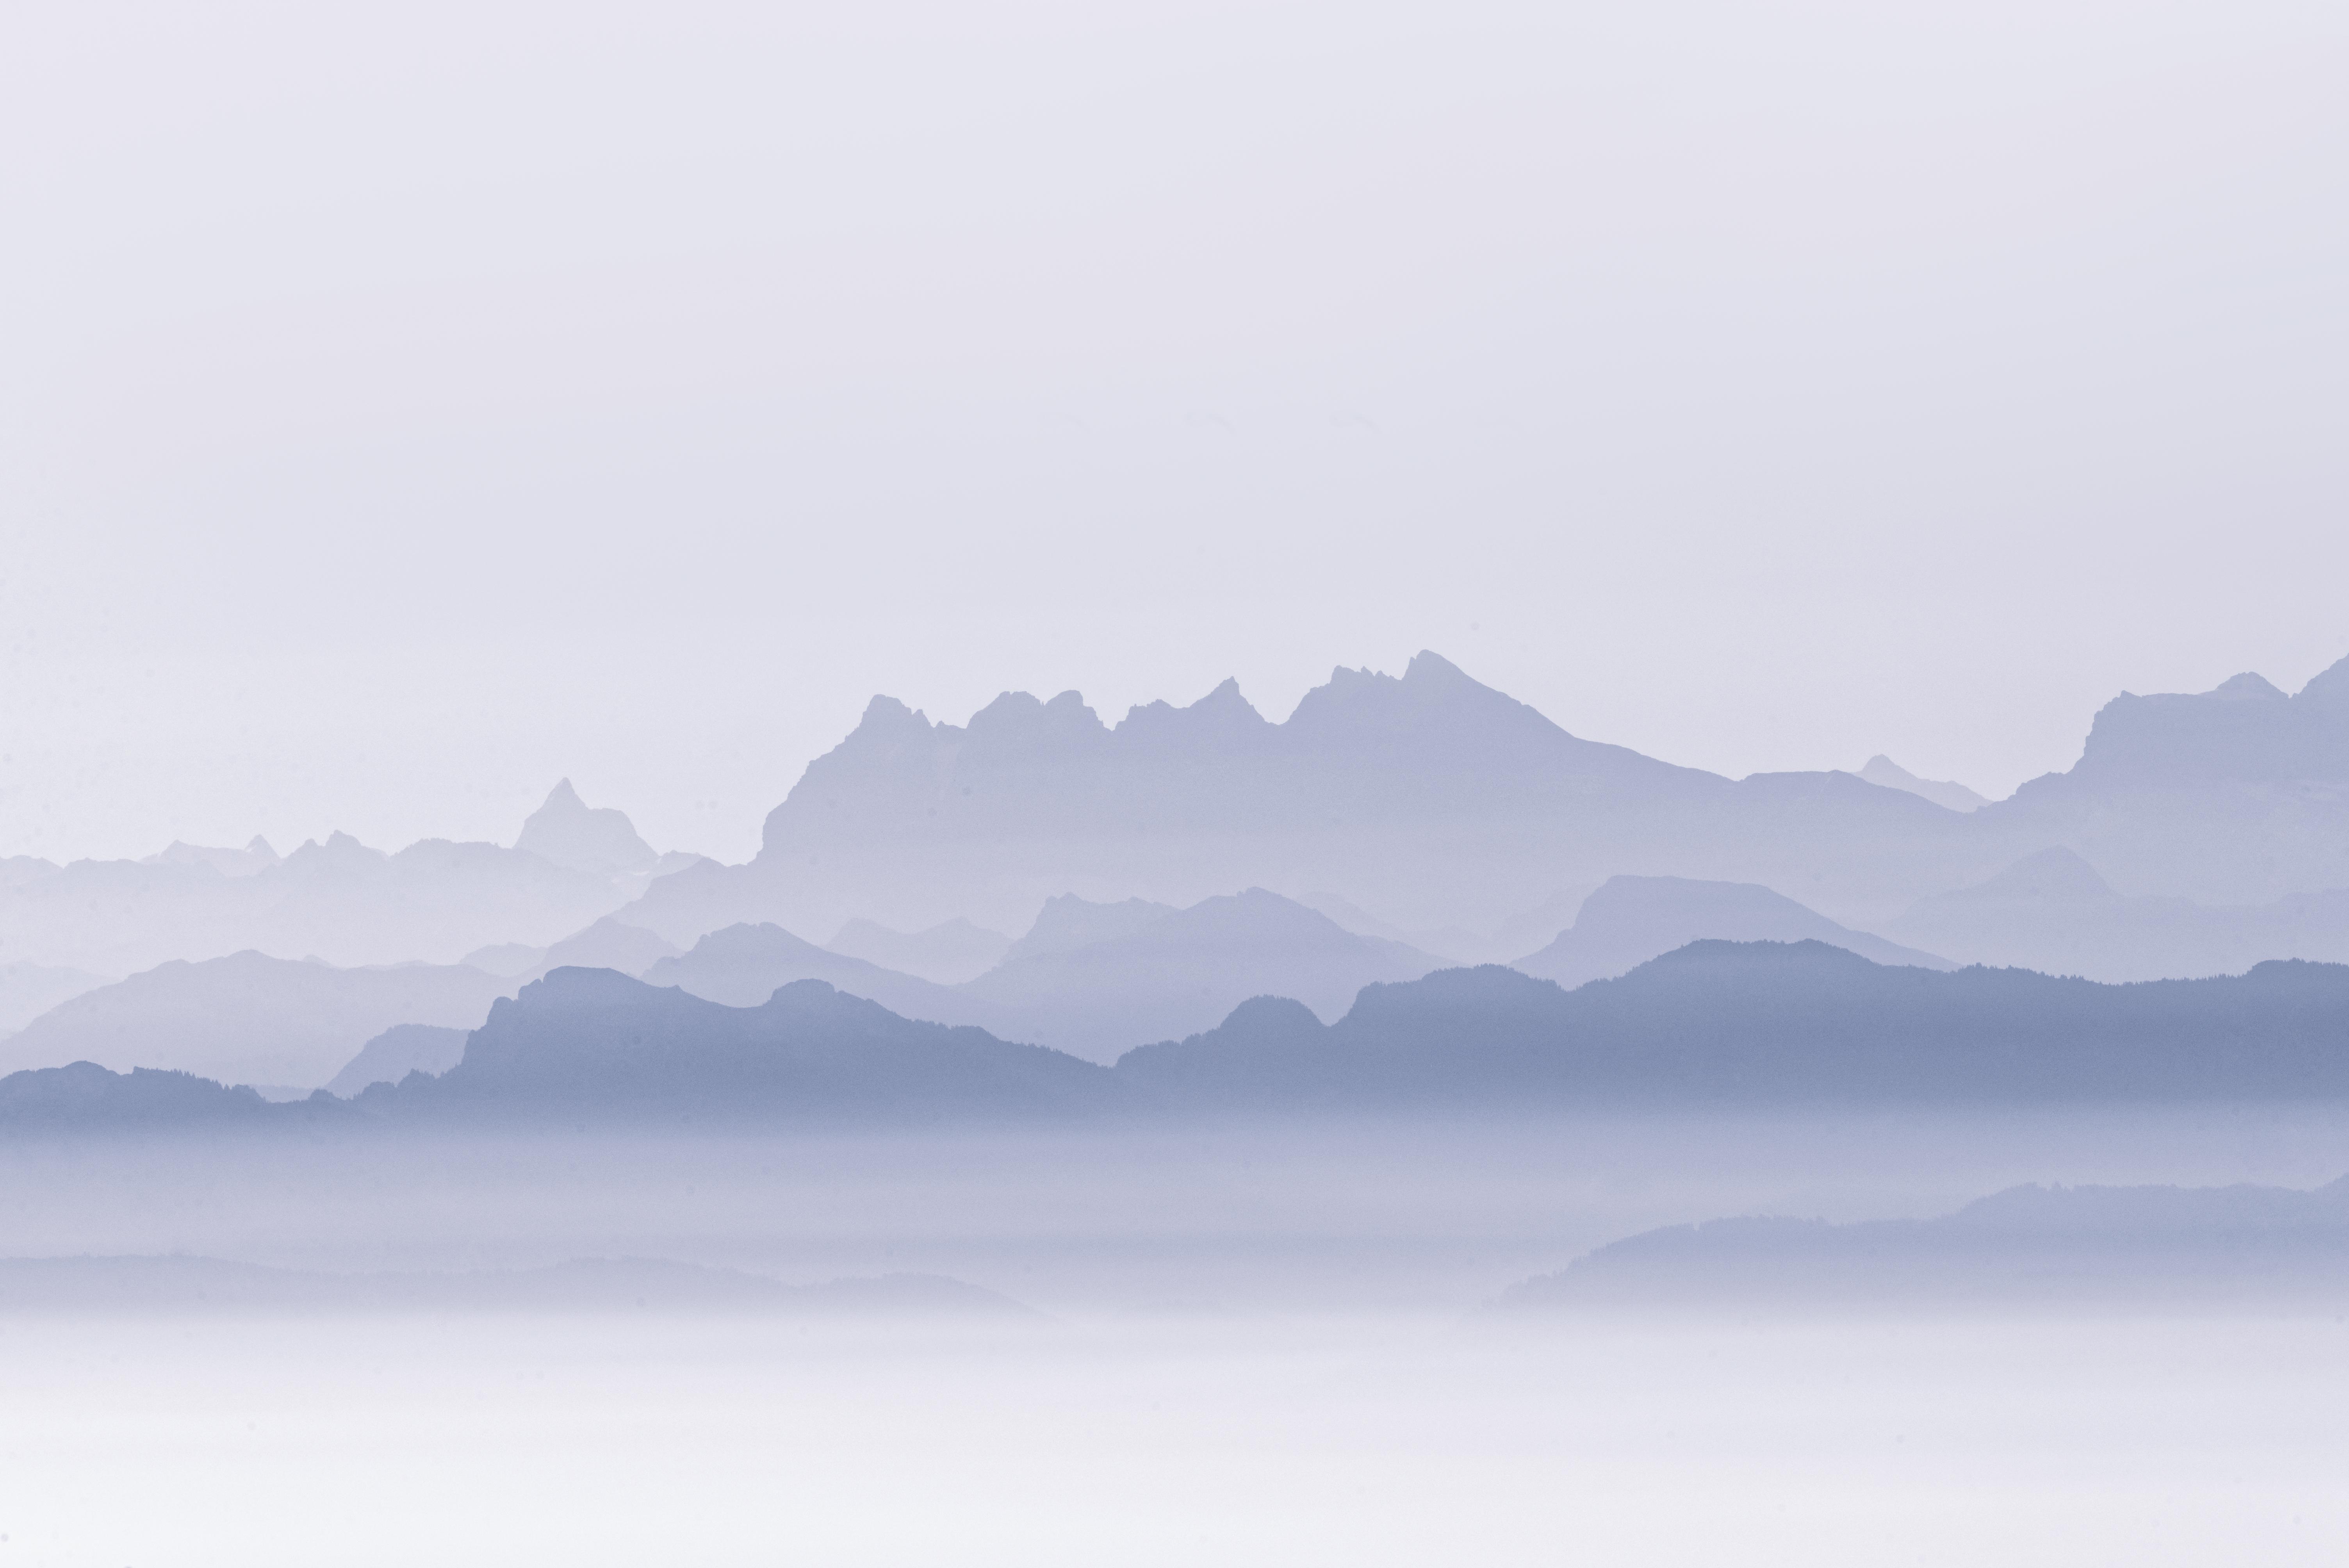 Catégorie1_Gost-Mountains_AnandaJoinet